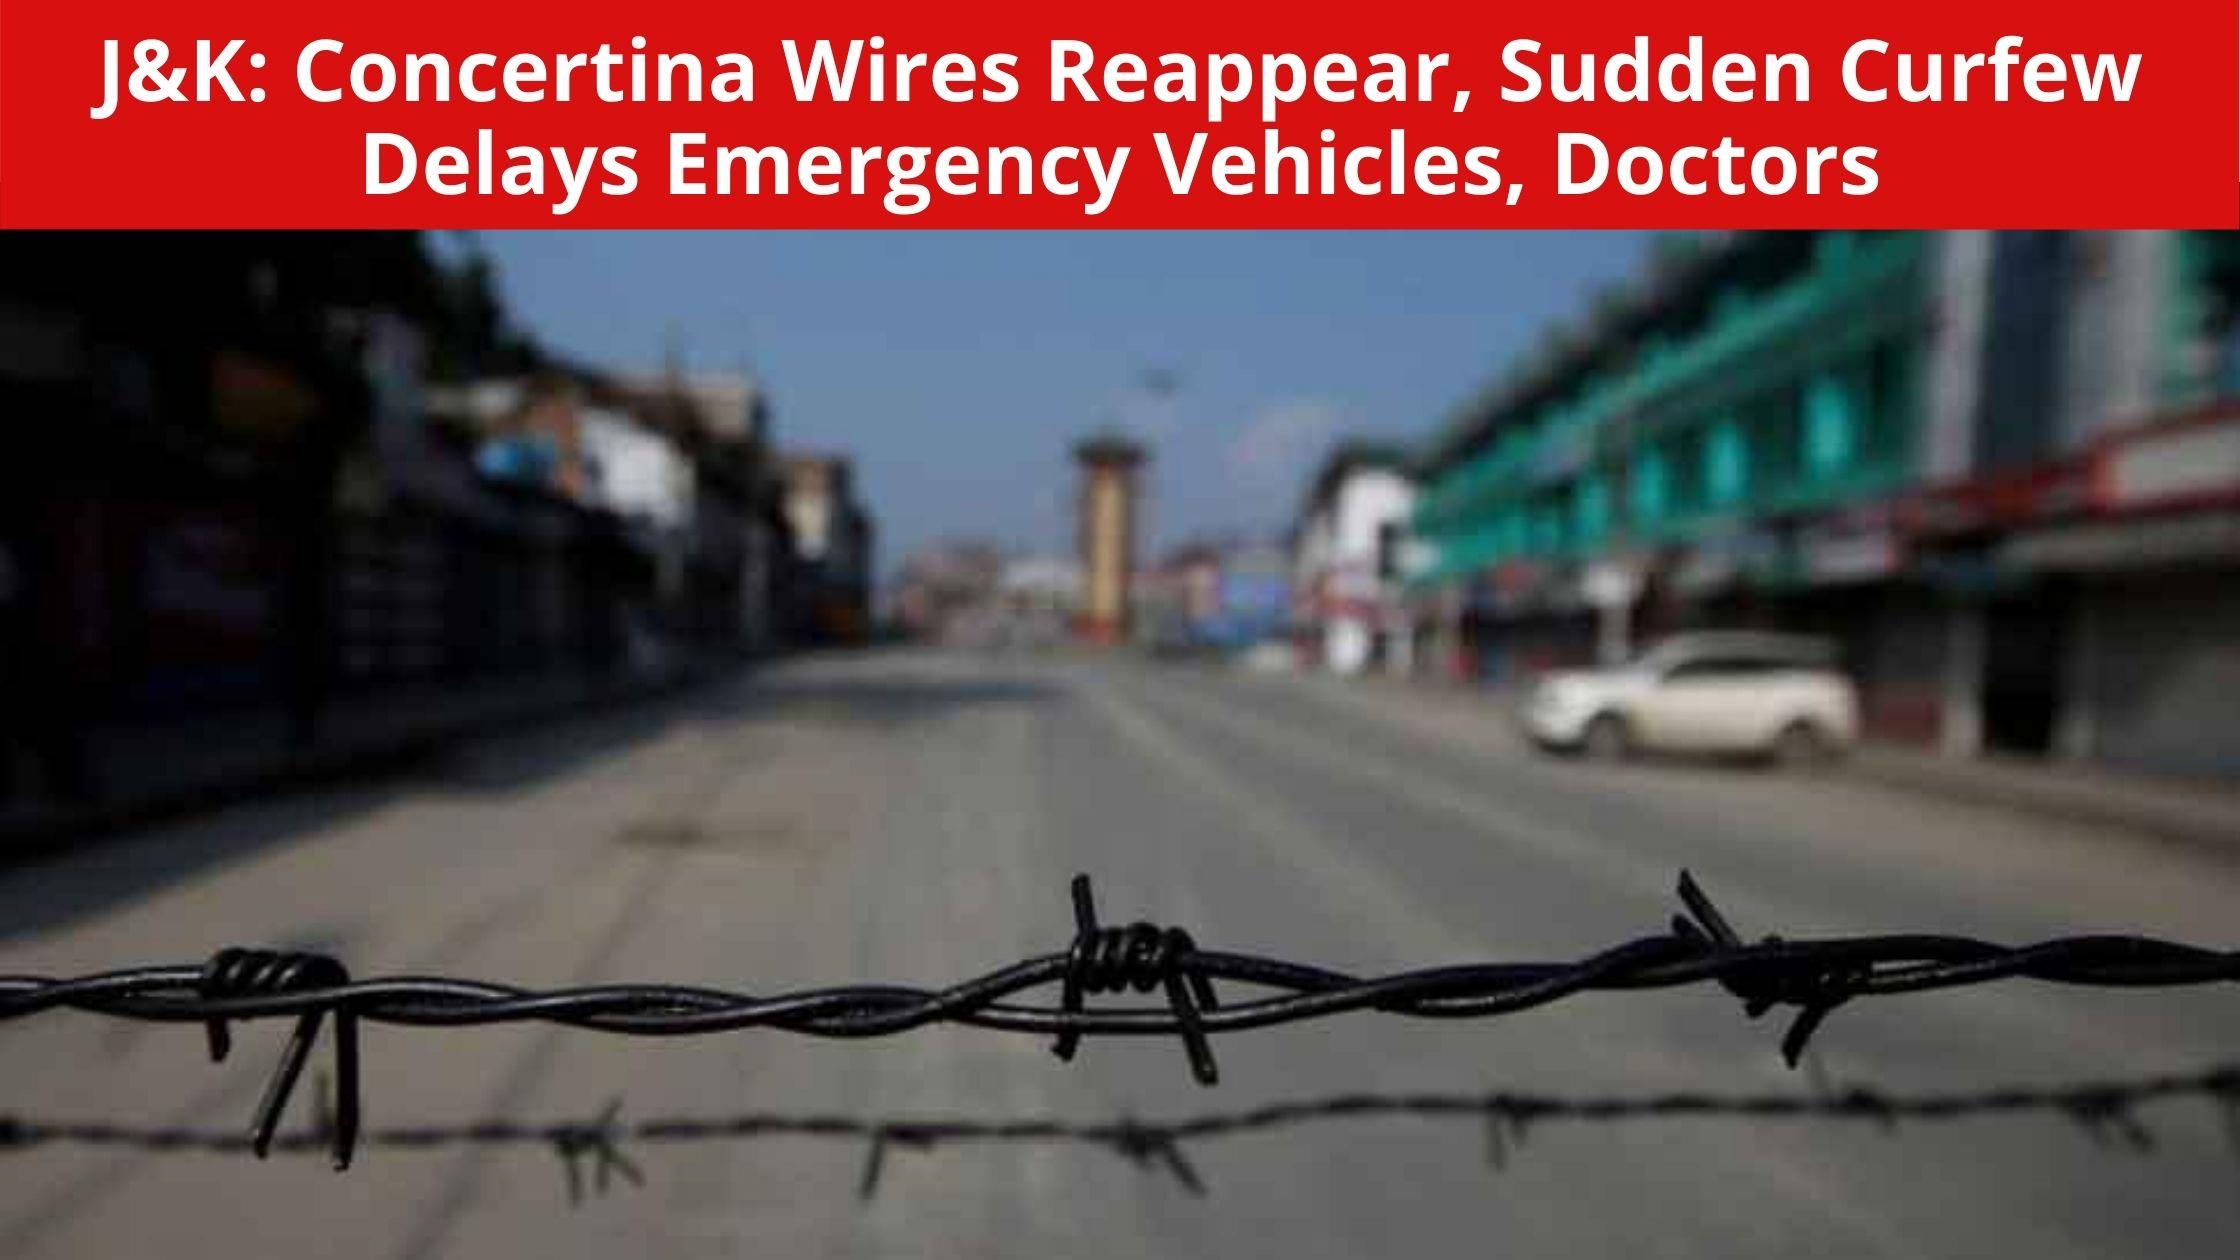 J&K_ Concertina Wires Reappear, Sudden Curfew Delays Emergency Vehicles, Doctors